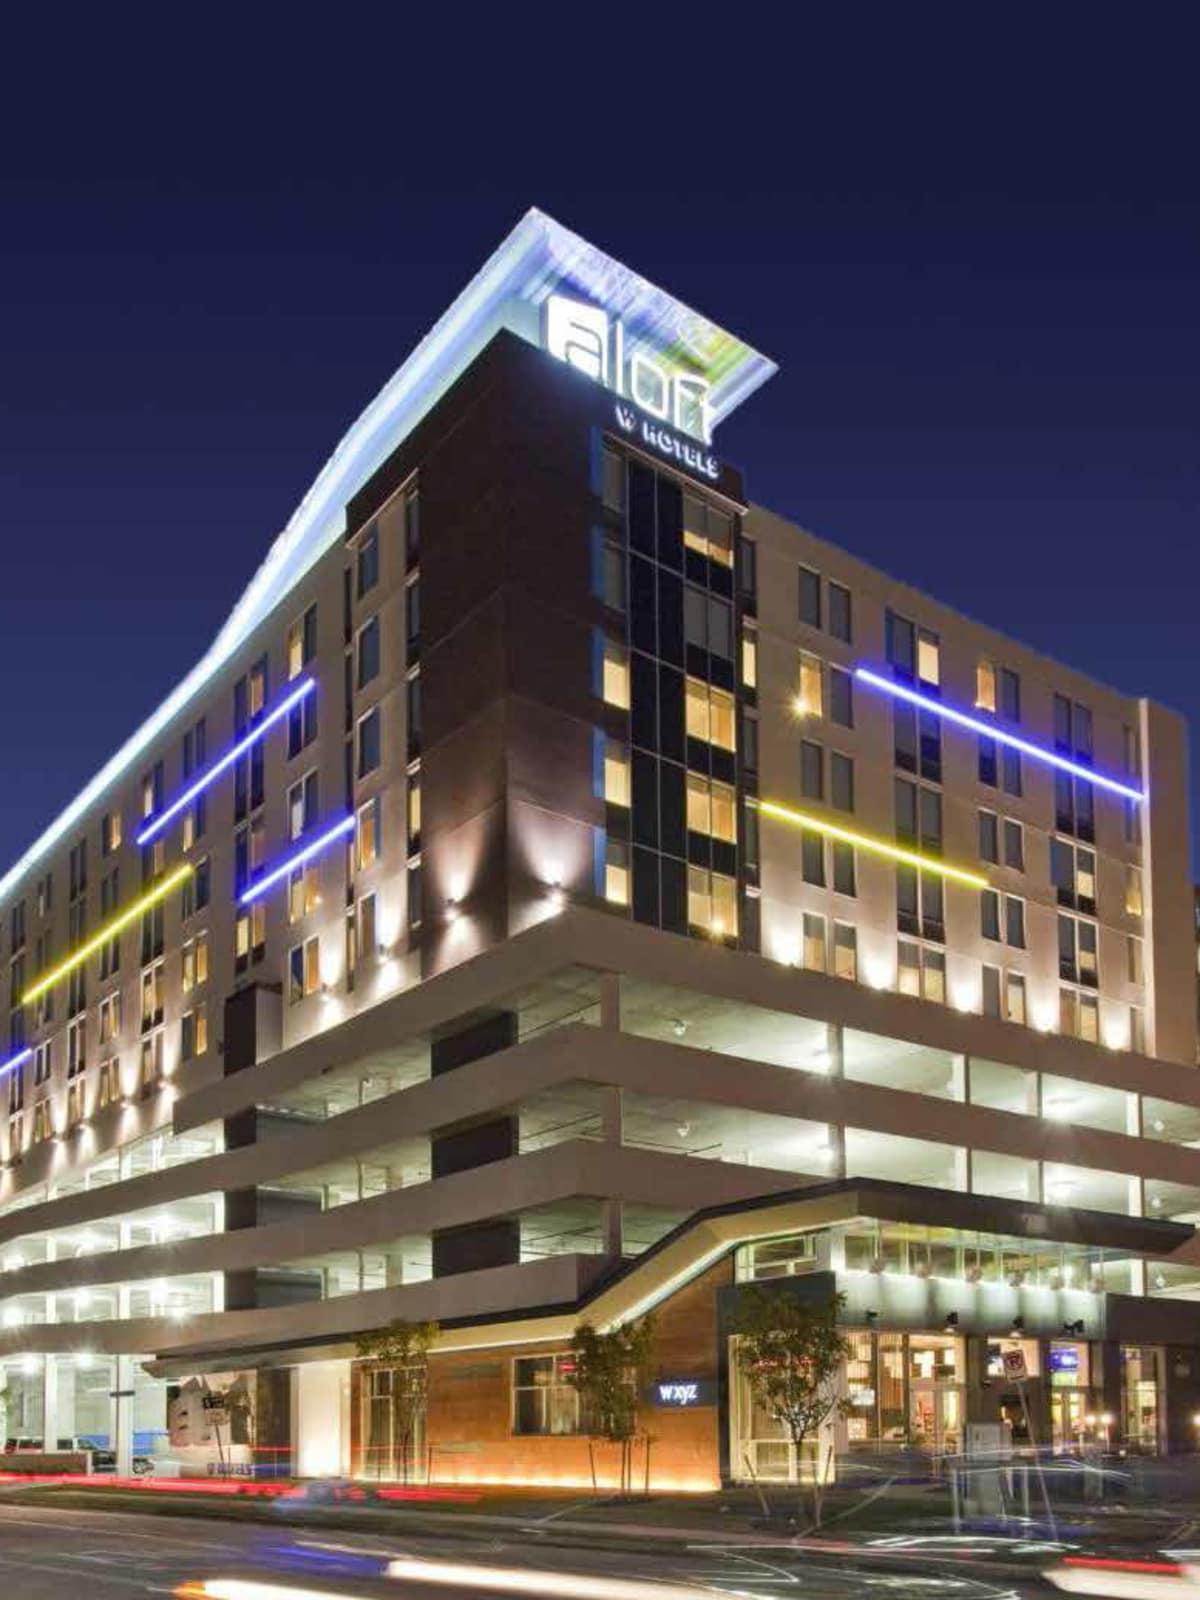 Aloft Hotel Houston Galleria